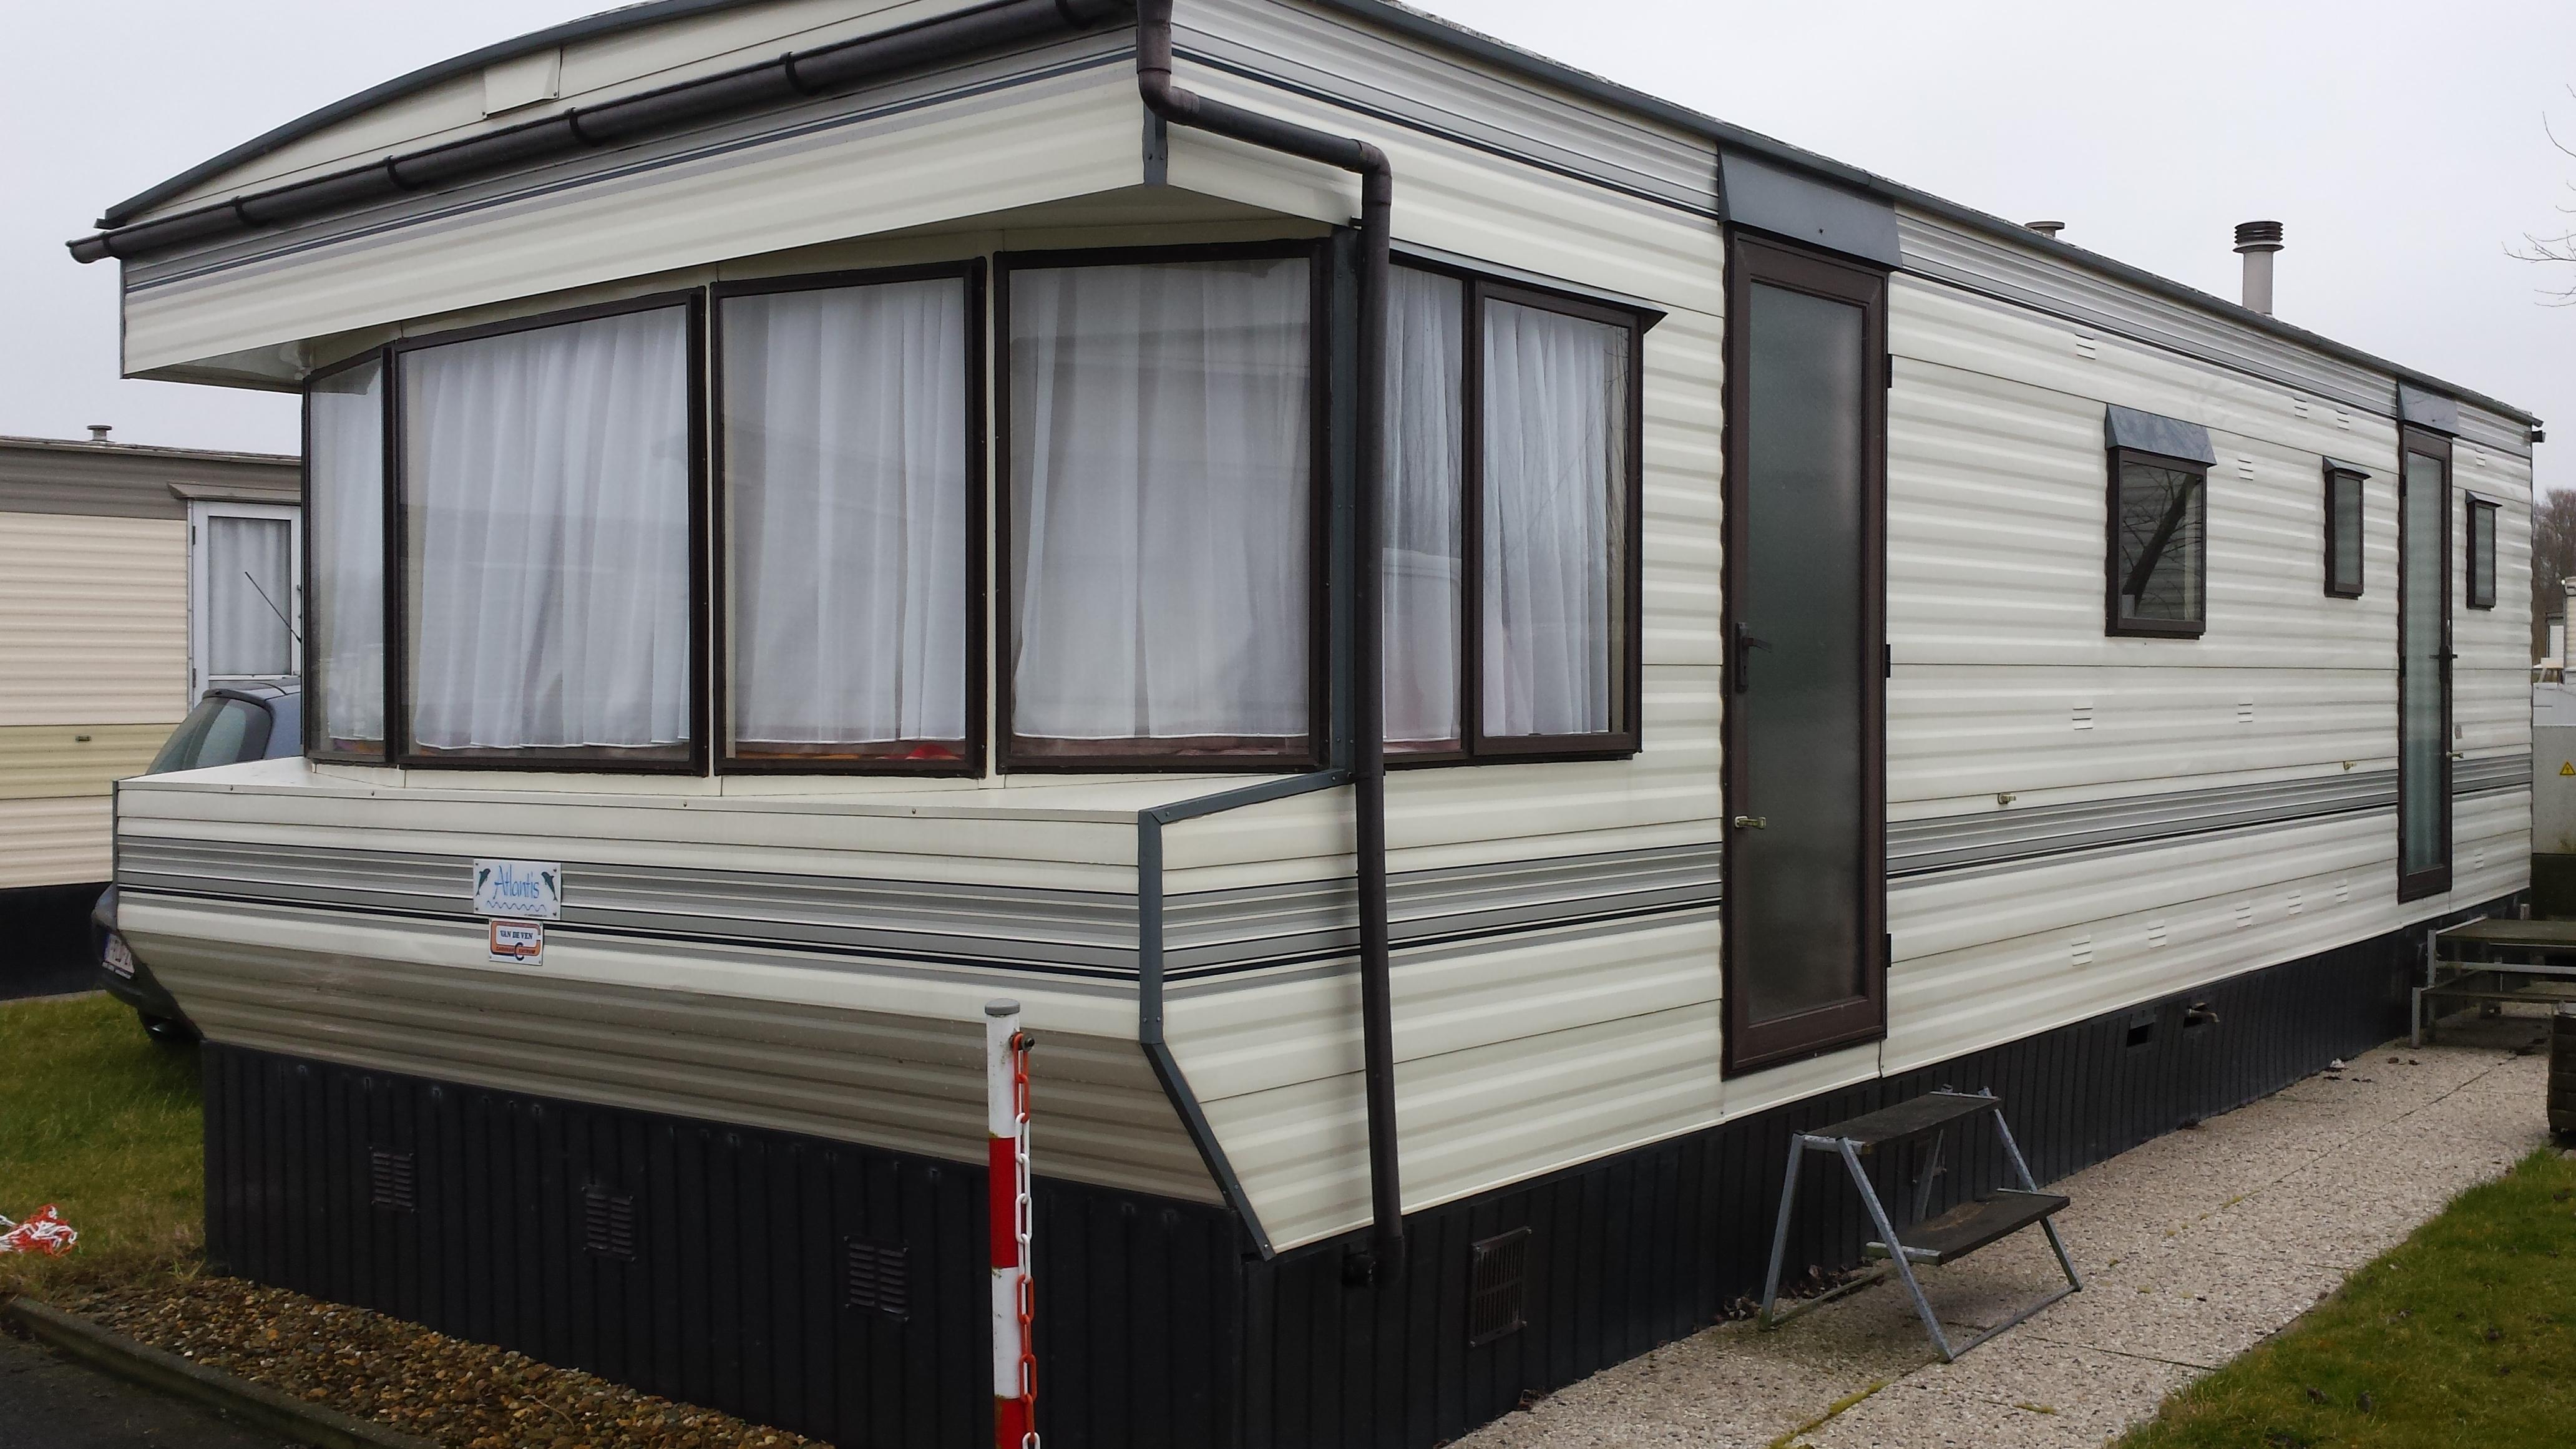 park de vuurtoren occasions caravane mobil home chalets camping belgique c te. Black Bedroom Furniture Sets. Home Design Ideas